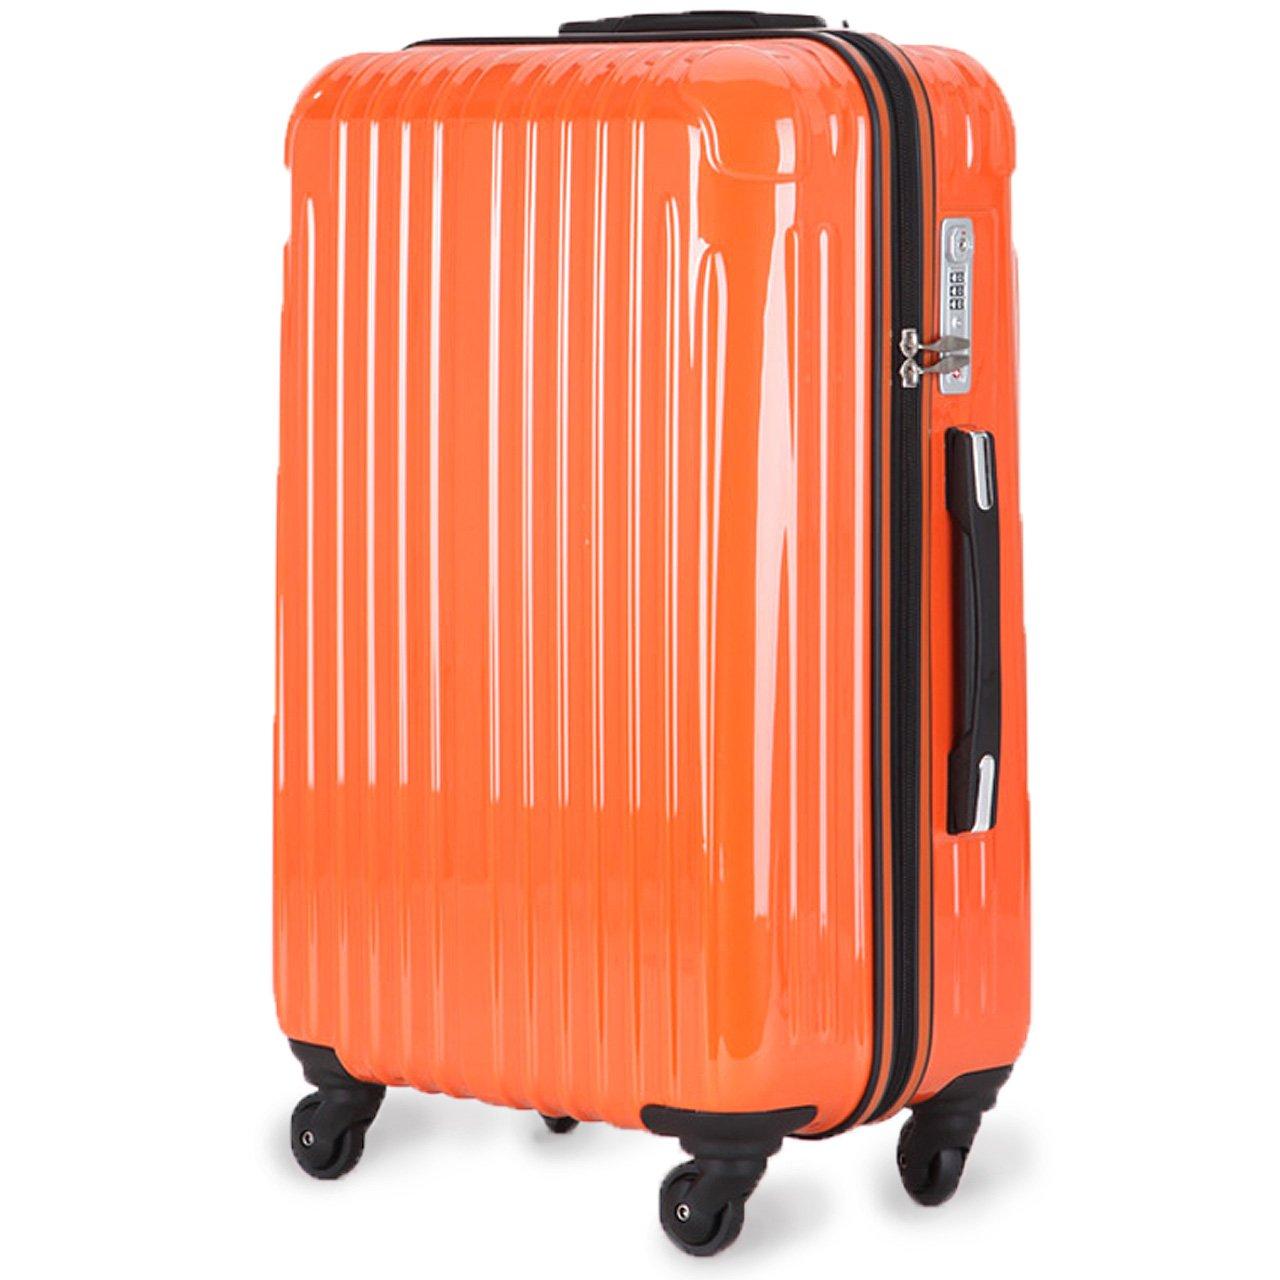 strike[ストライク]超軽量 2年保証 スーツケース TSAロック搭載 旅行バック トランクケース 旅行カバン B0757GVL2T 大型アウトレット|オレンジ オレンジ 大型アウトレット